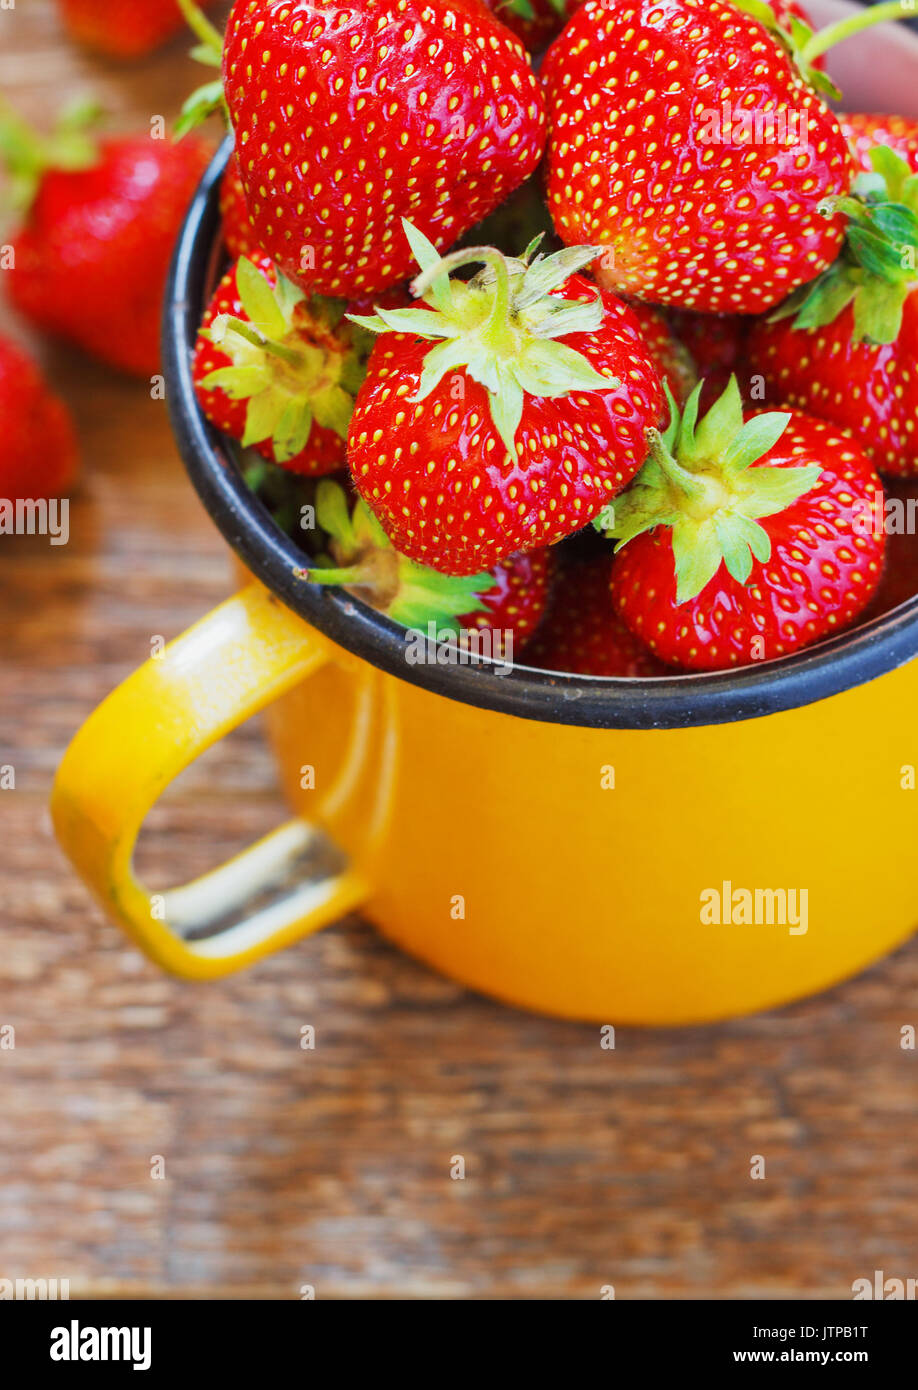 Strawberry Garden Rustic Cup Summer Food yellow Metal dark Background Selective Focus - Stock Image